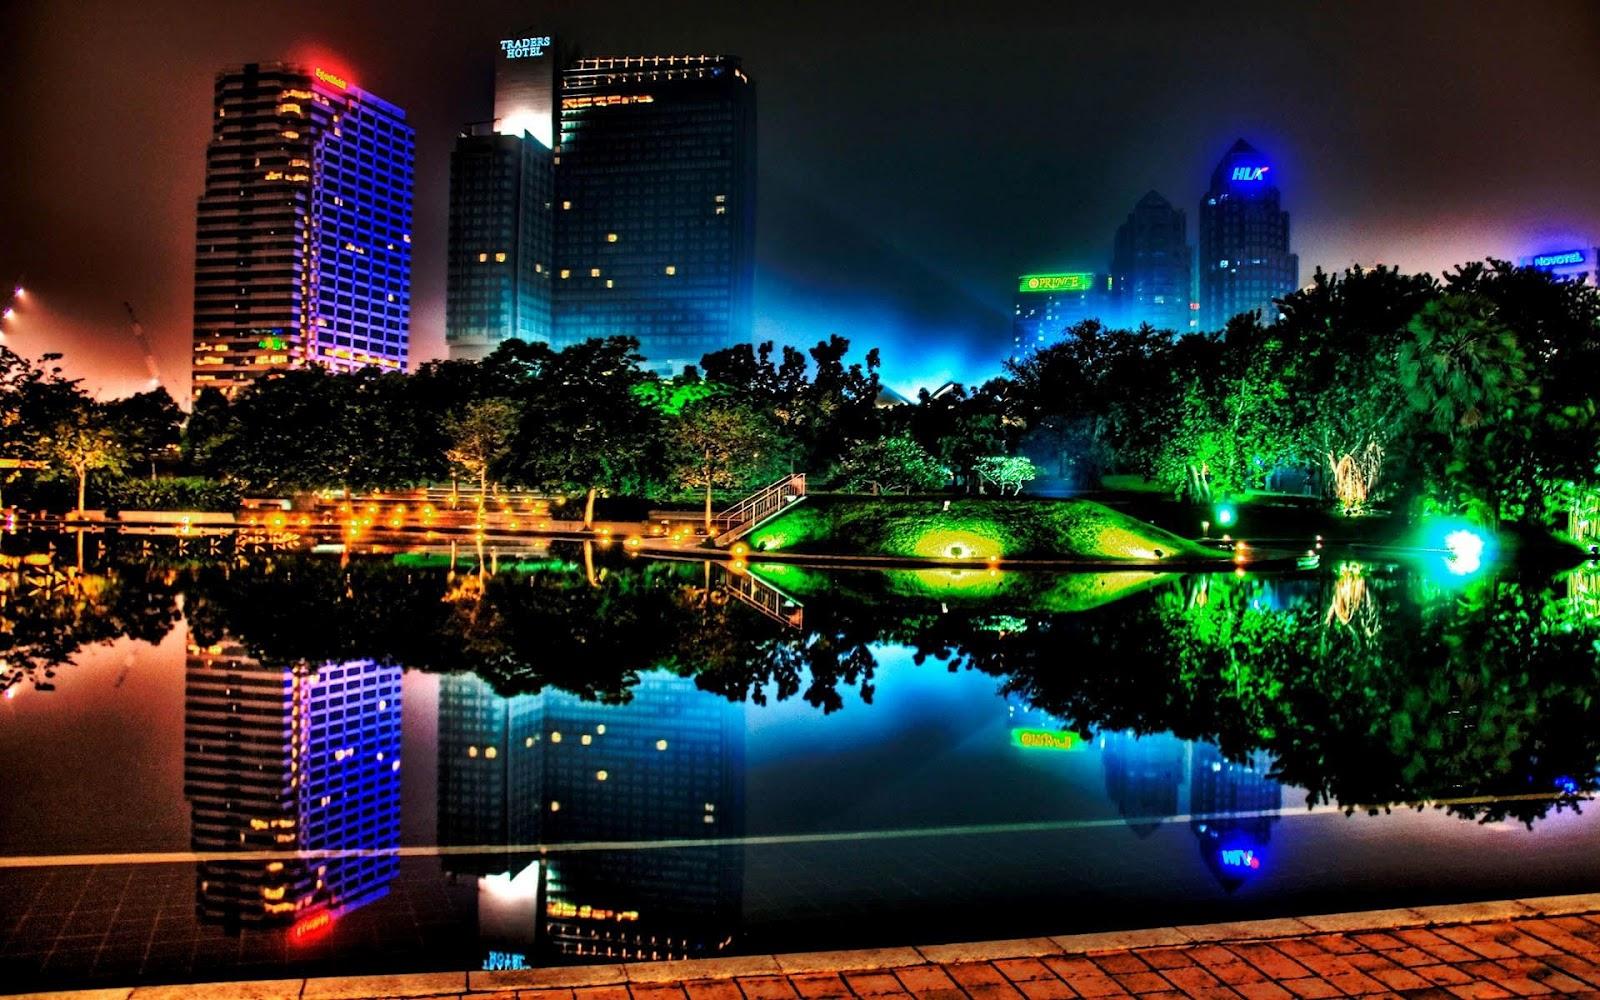 http://3.bp.blogspot.com/-1RKaoI6Gl2Y/T1E6aEohBPI/AAAAAAAABQE/DUf4bBzYiE4/s1600/Night_neon.jpg